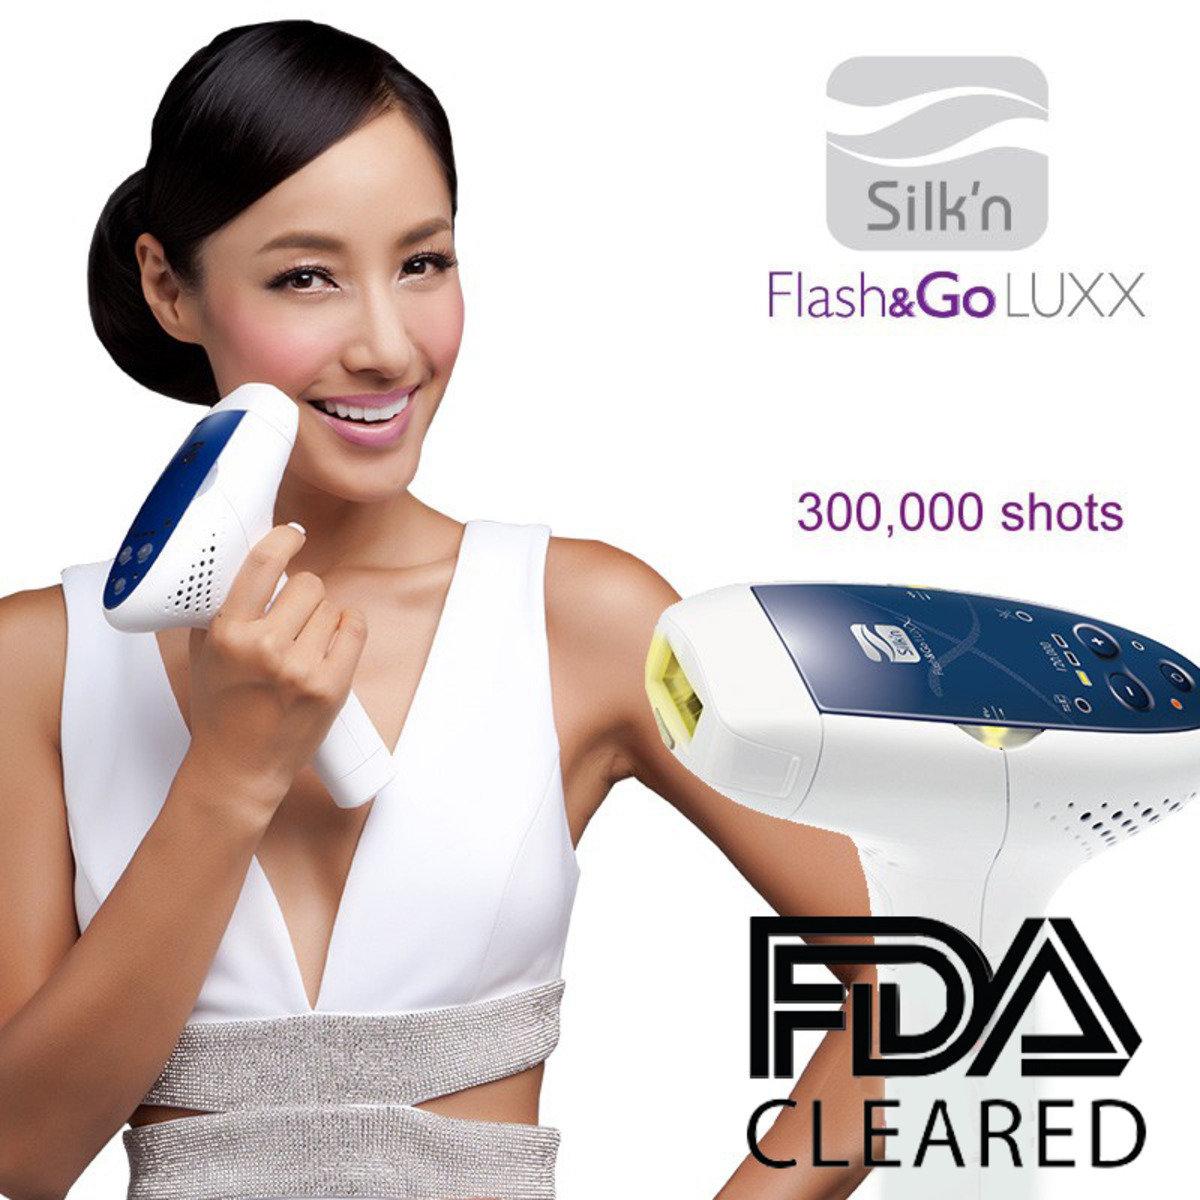 Silk'n Flash & Go Luxx 300K 宅光脫毛機(連一個300,000次燈盒) 加送價值$688 5k面部煥膚燈盒(health120)一個